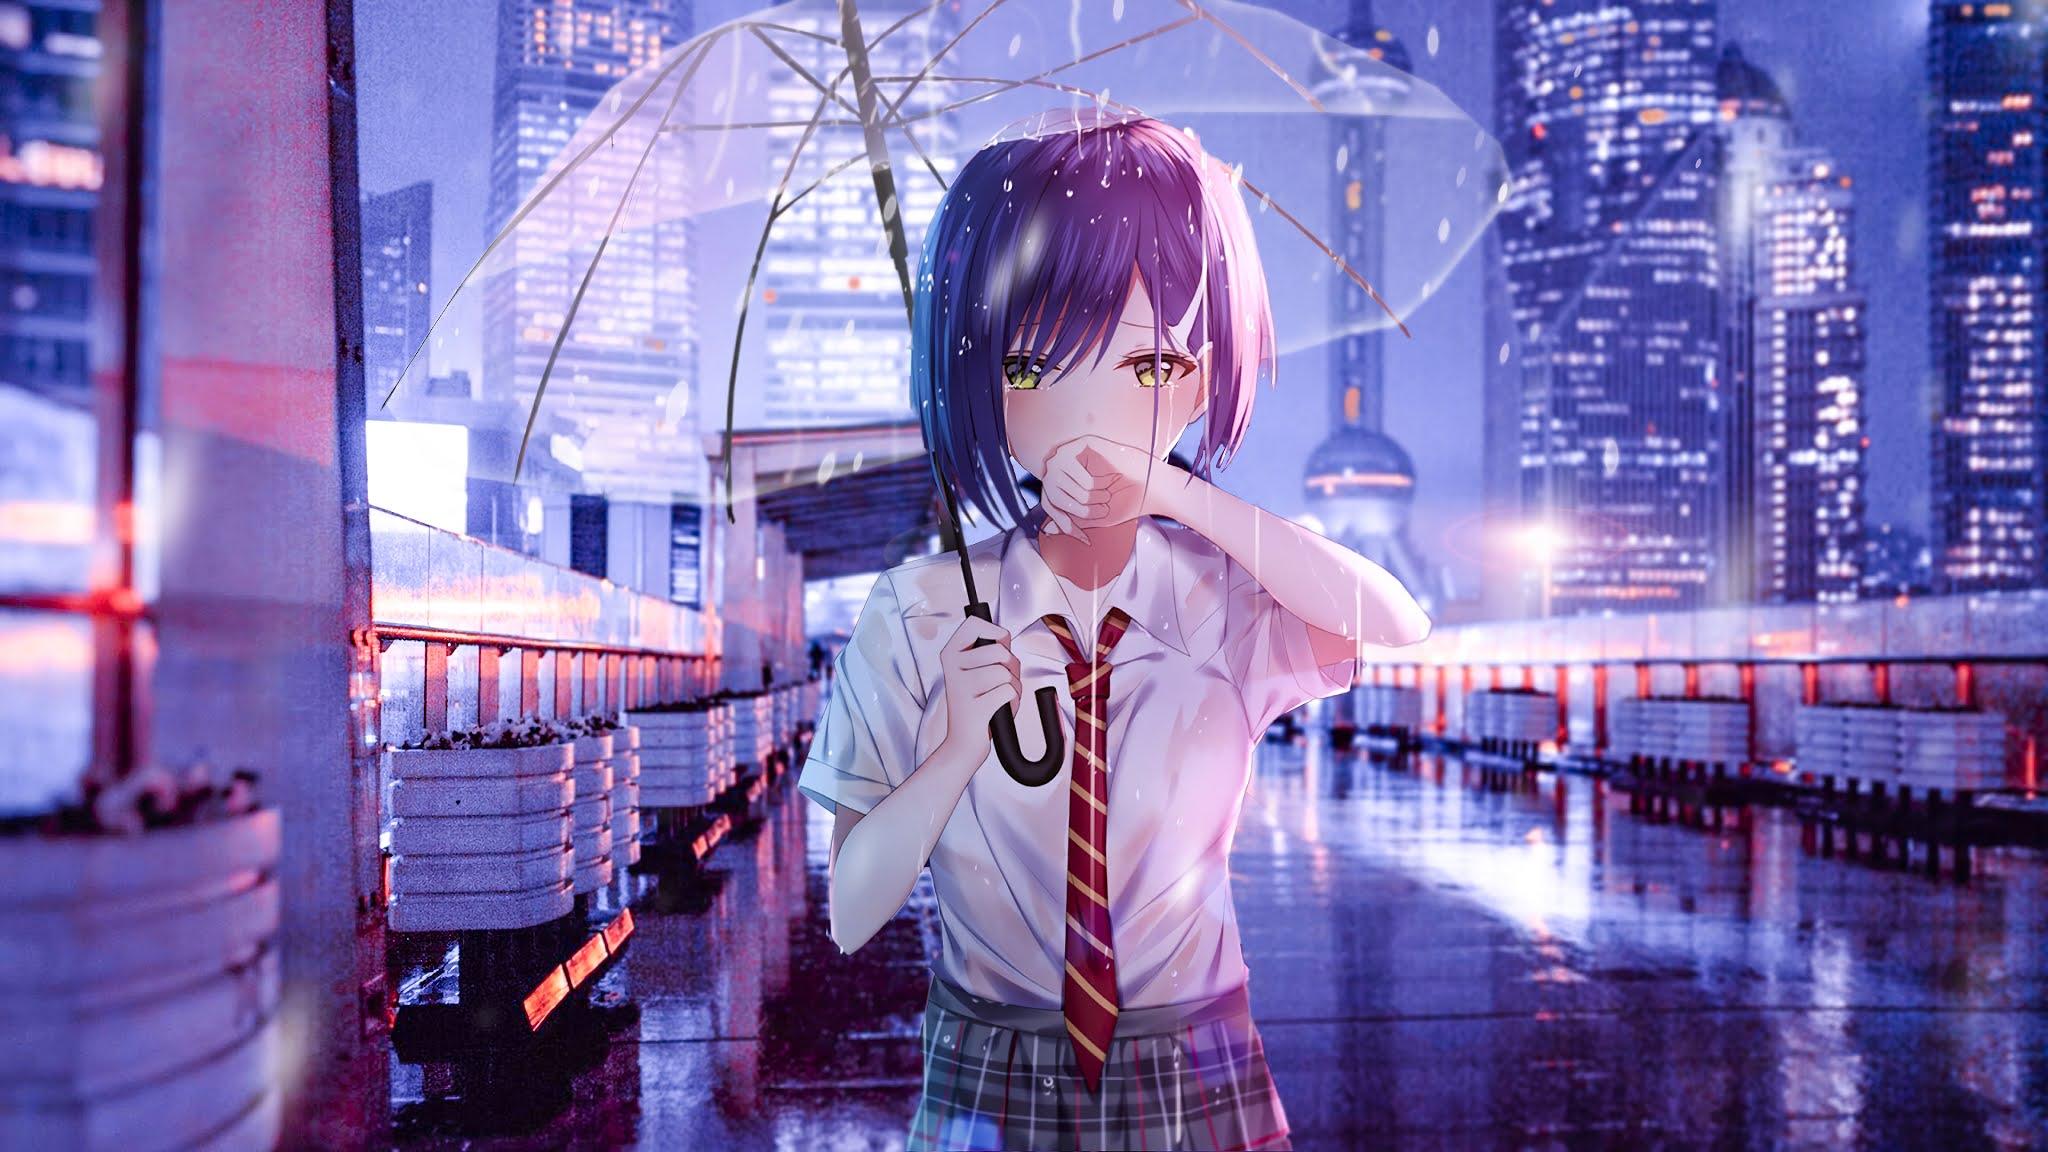 anime girl crying in the rain